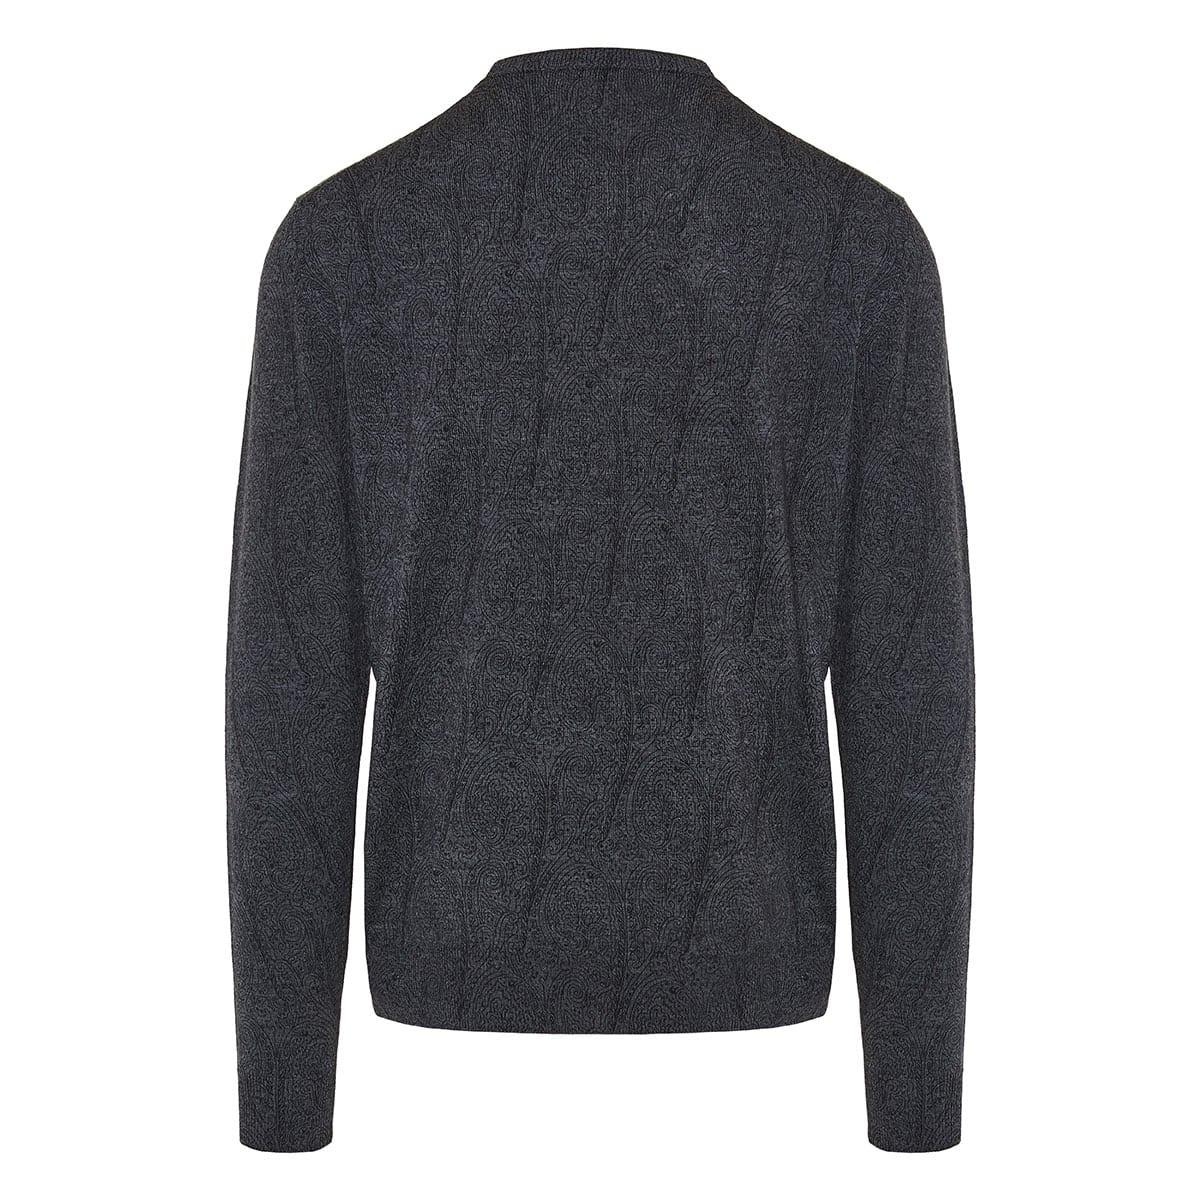 Paisley print sweater